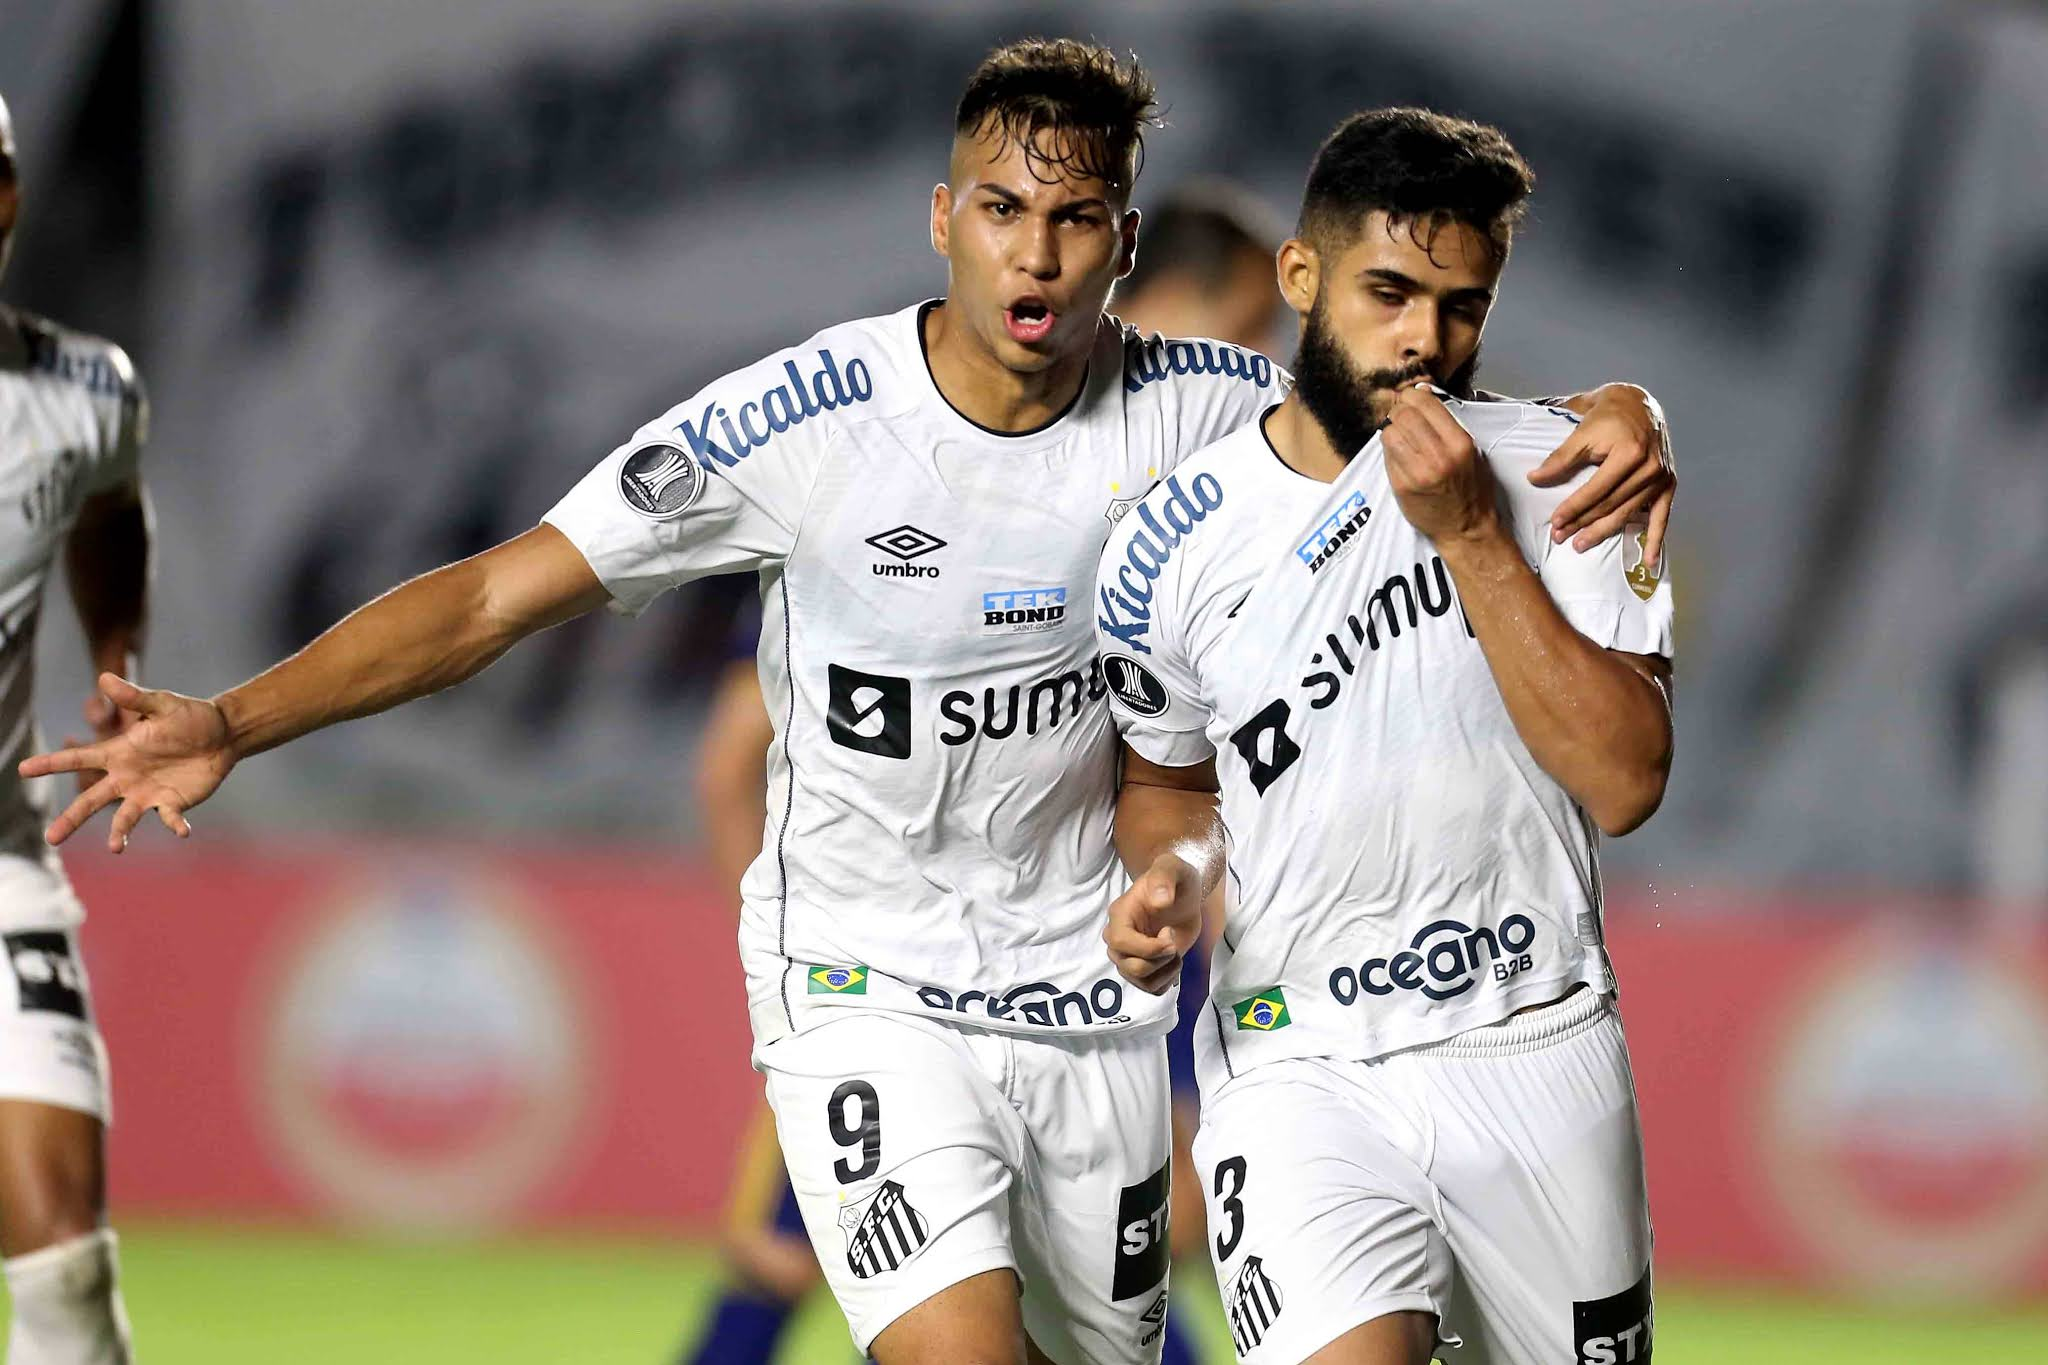 Santos 1 - Boca Juniors 1